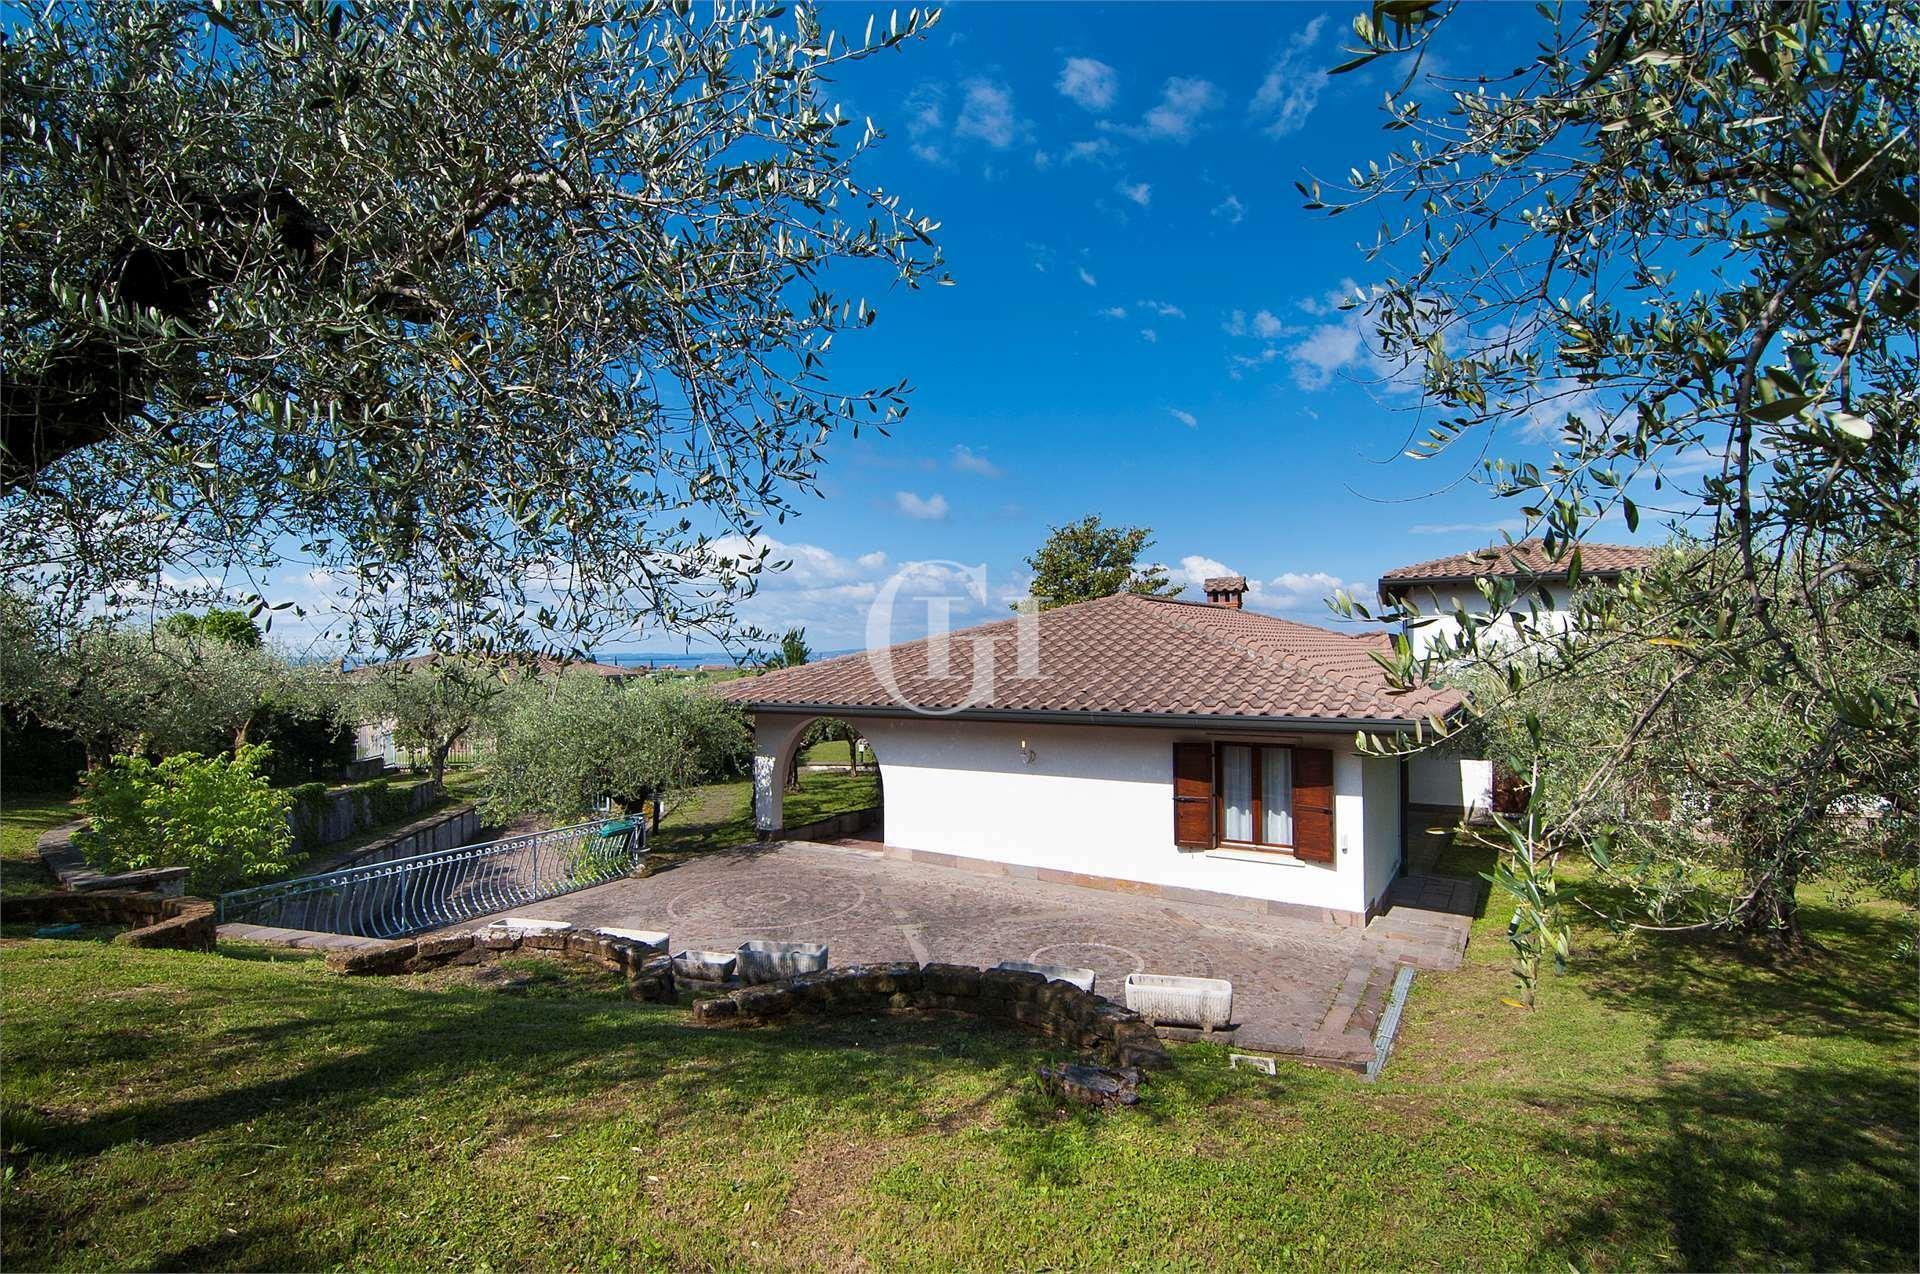 Villa in Villaggi Santi-San Fermo, Veneto, Italy 1 - 11499146